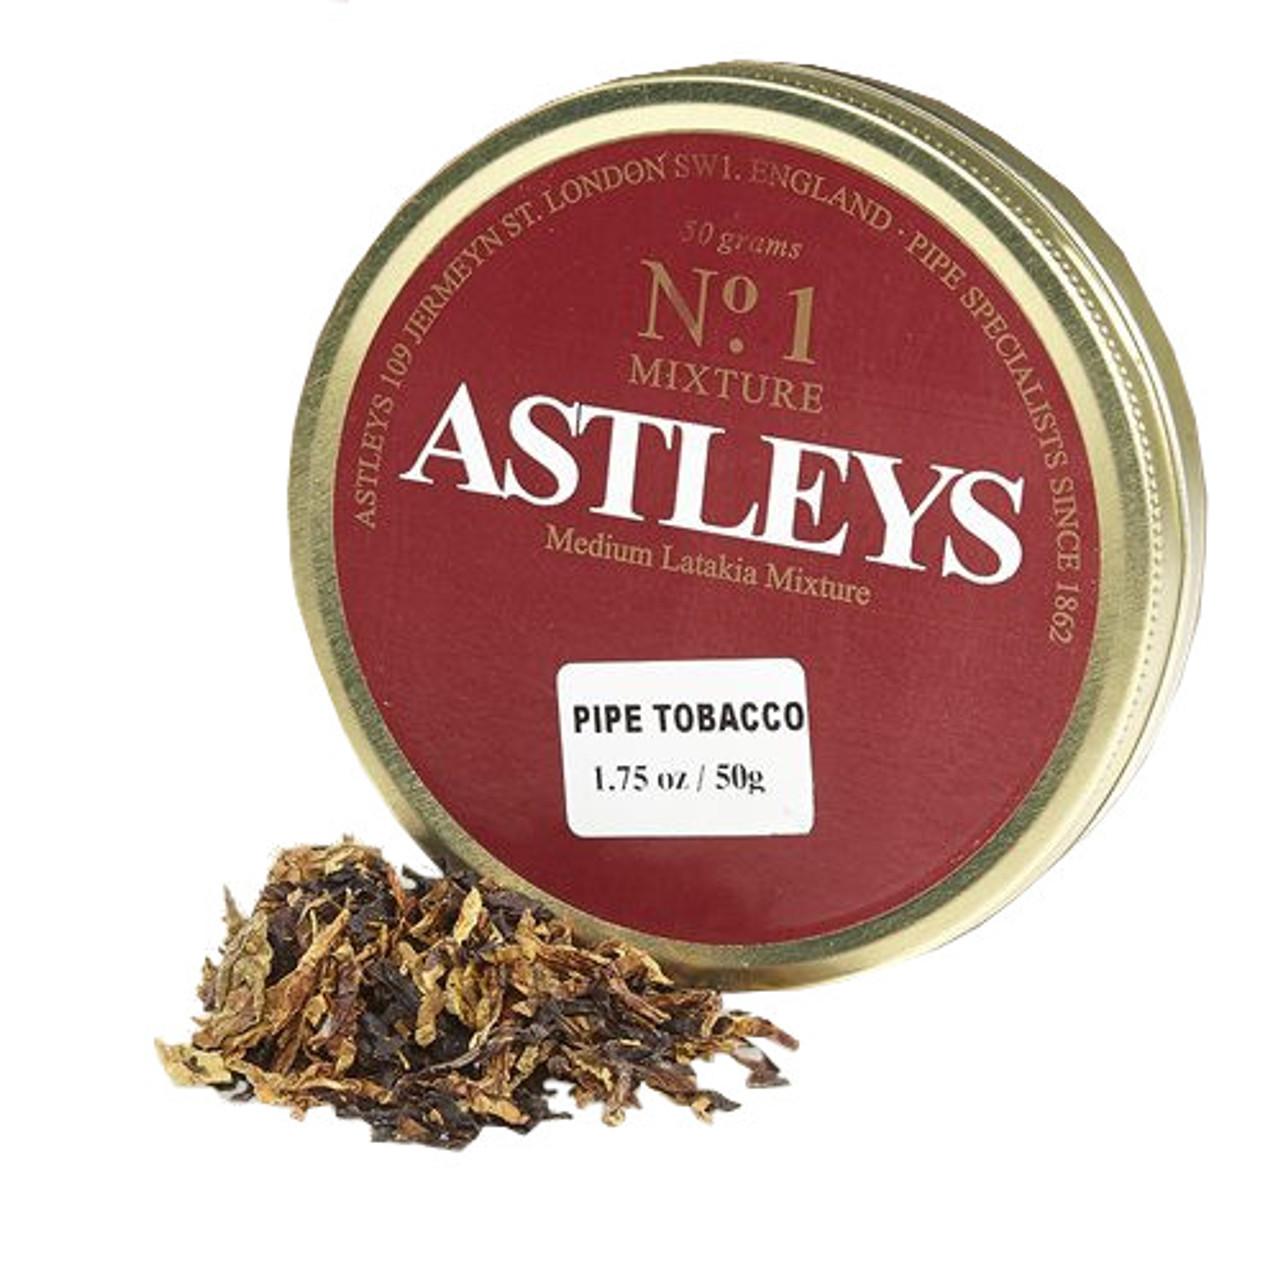 Astleys No. 1 Mixture Pipe Tobacco   1.75 OZ TIN